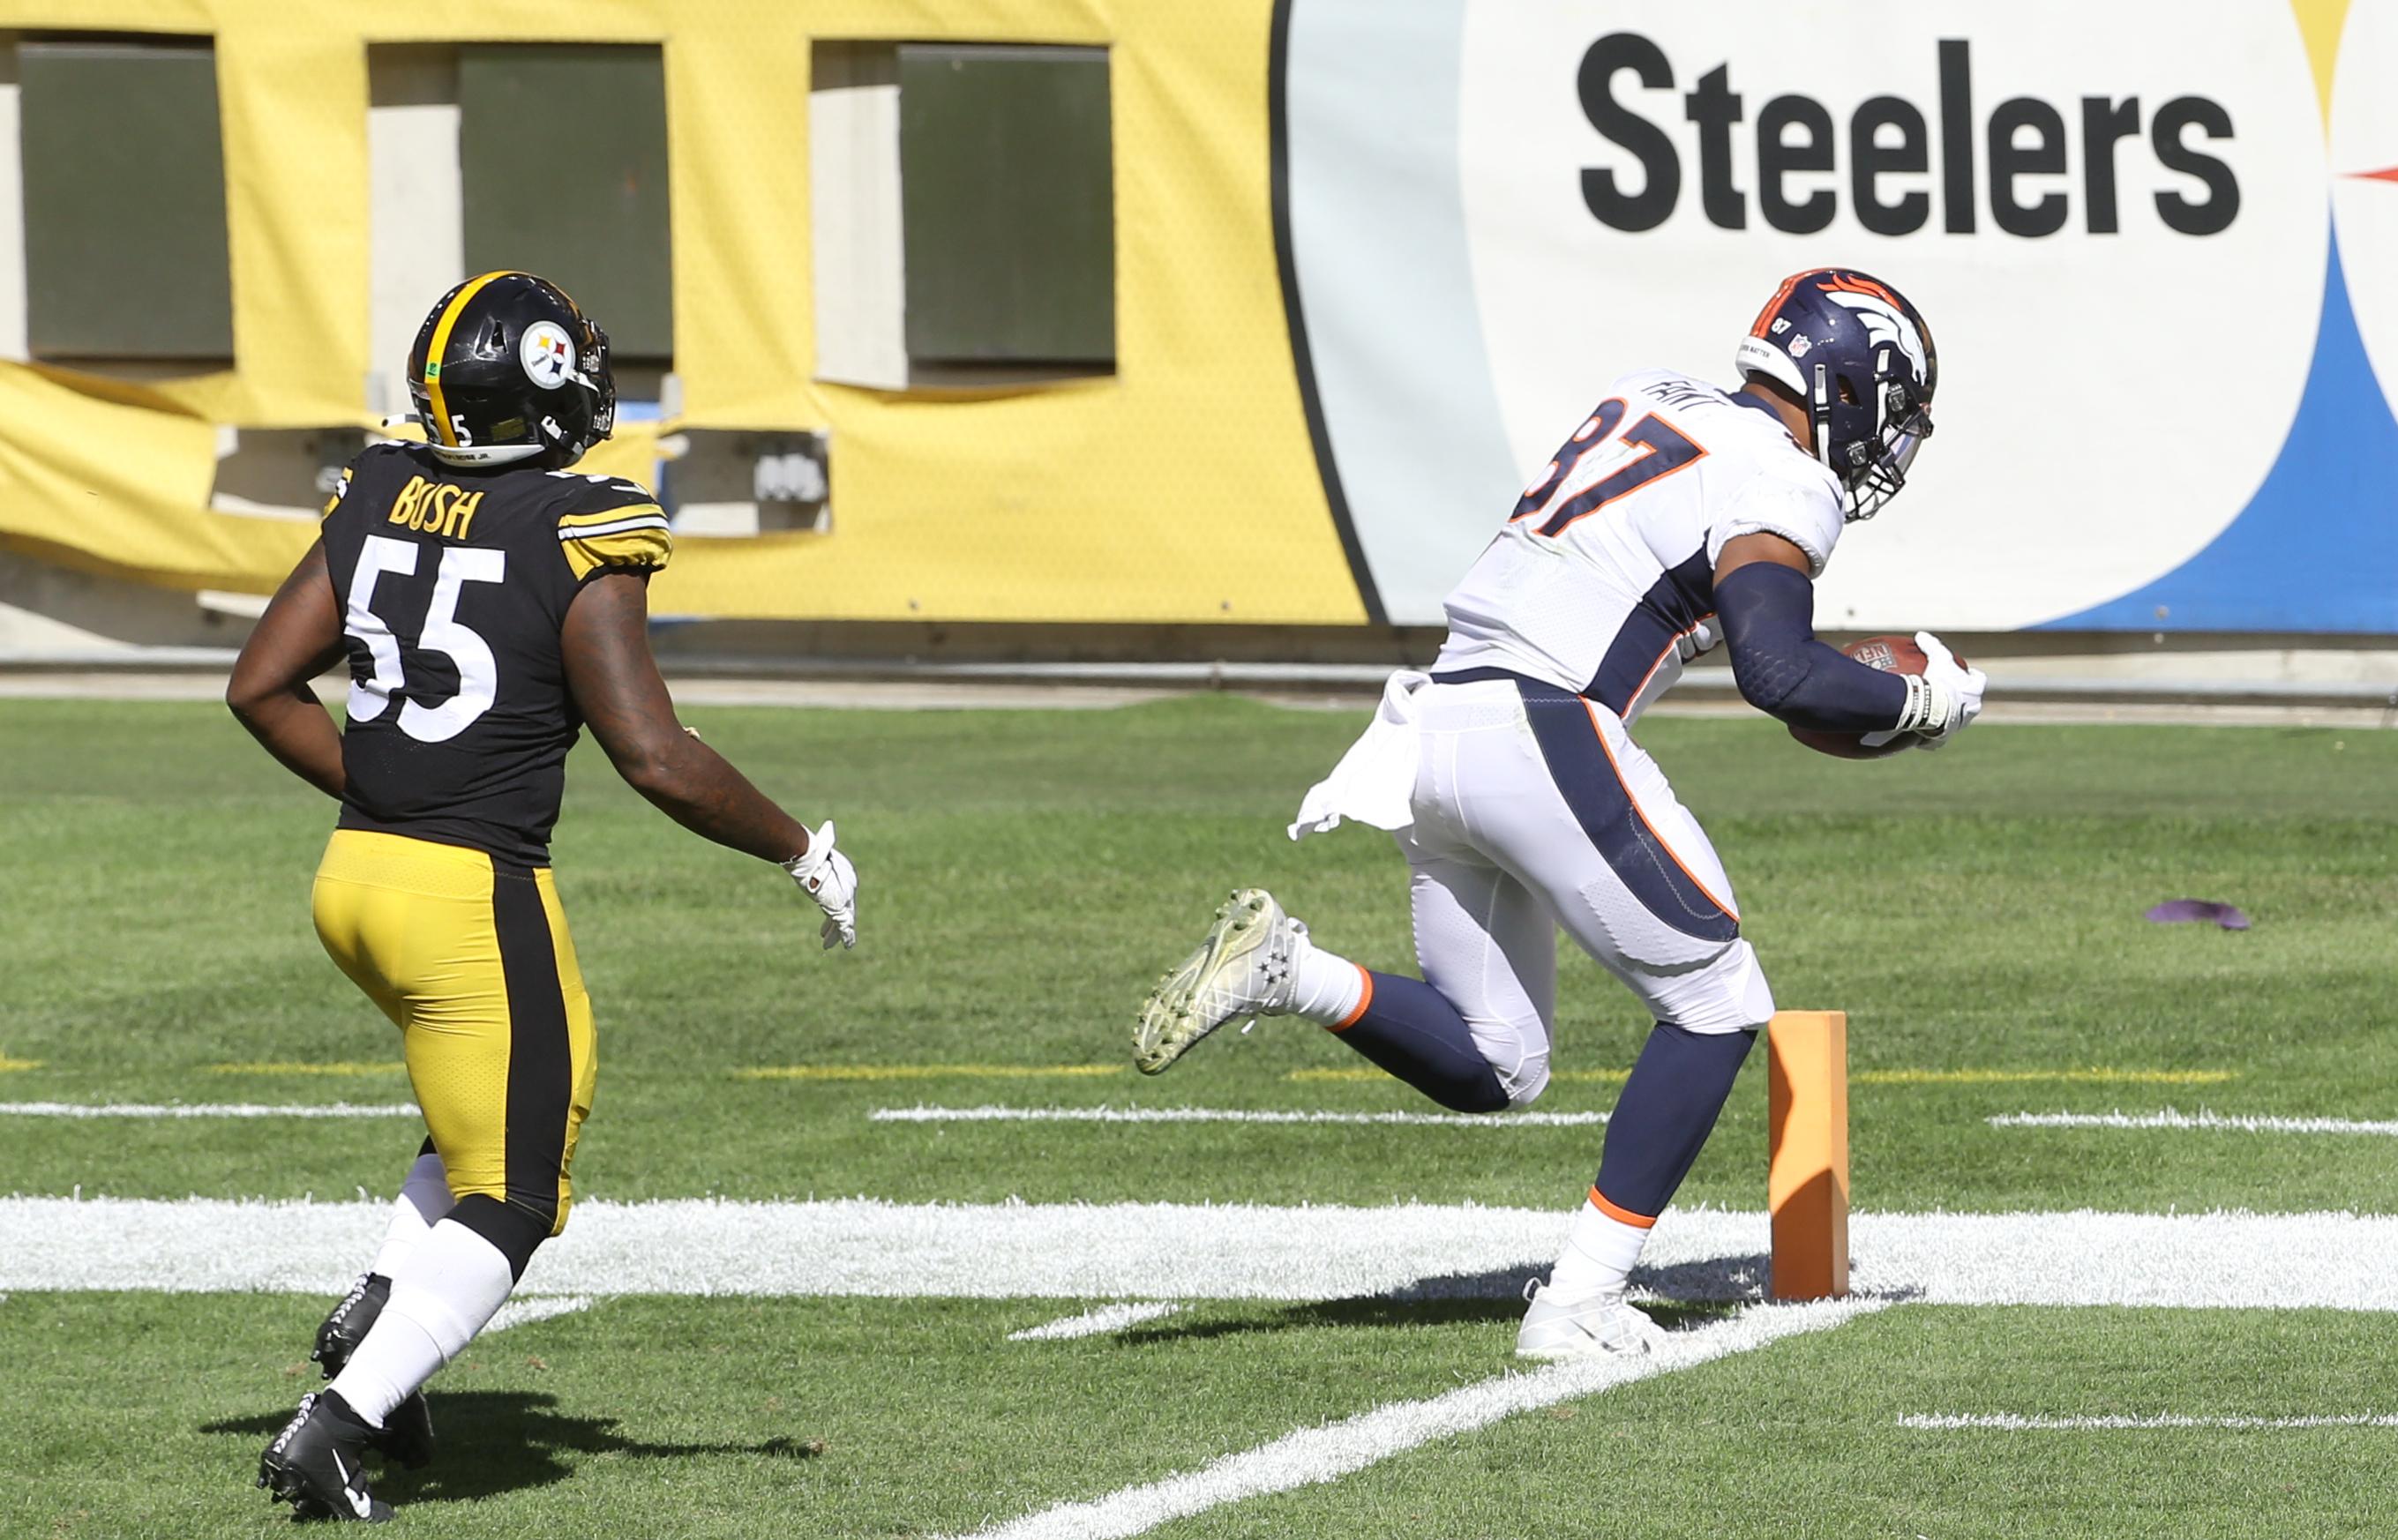 Denver Broncos tight end Noah Fant (87) scores a twenty yard touchdown behind Pittsburgh Steelers linebacker Devin Bush (55) during the third quarter at Heinz Field.